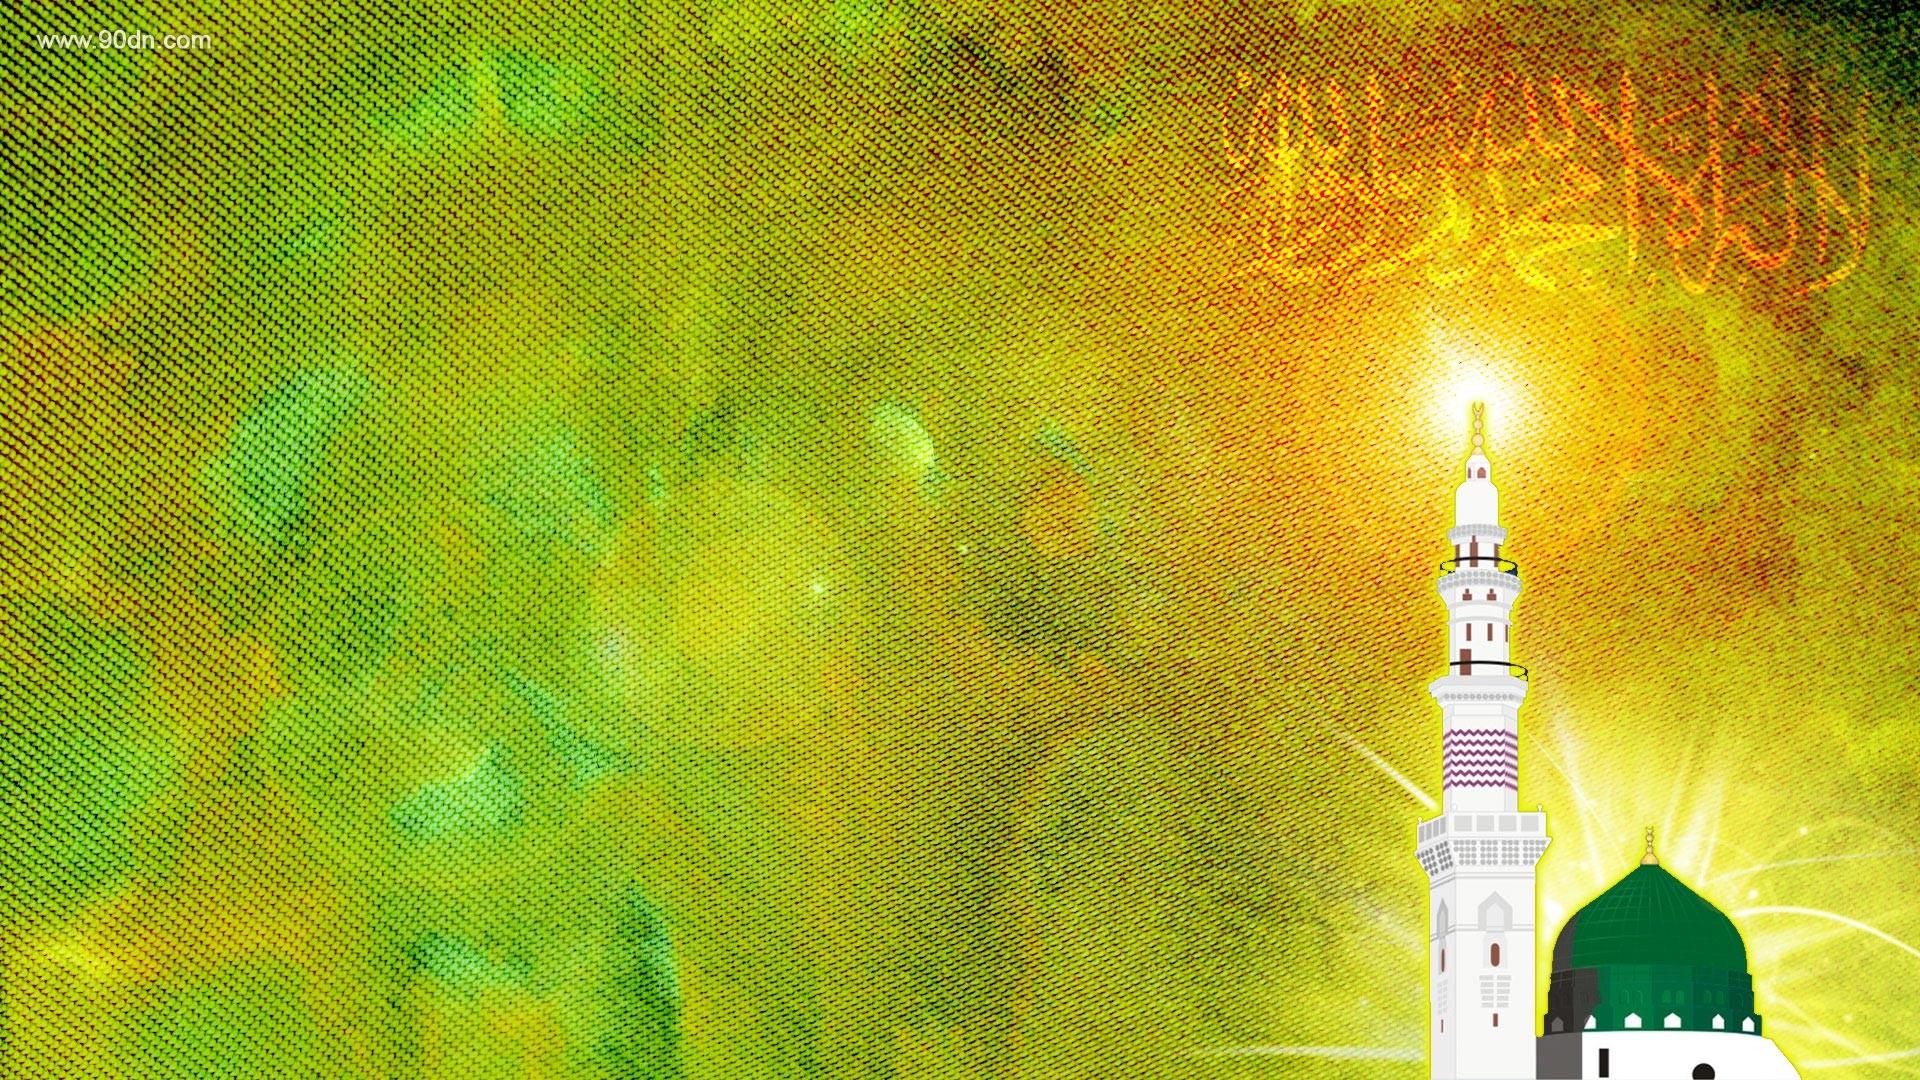 Wallpaper Islamic Wallpapers Islamic